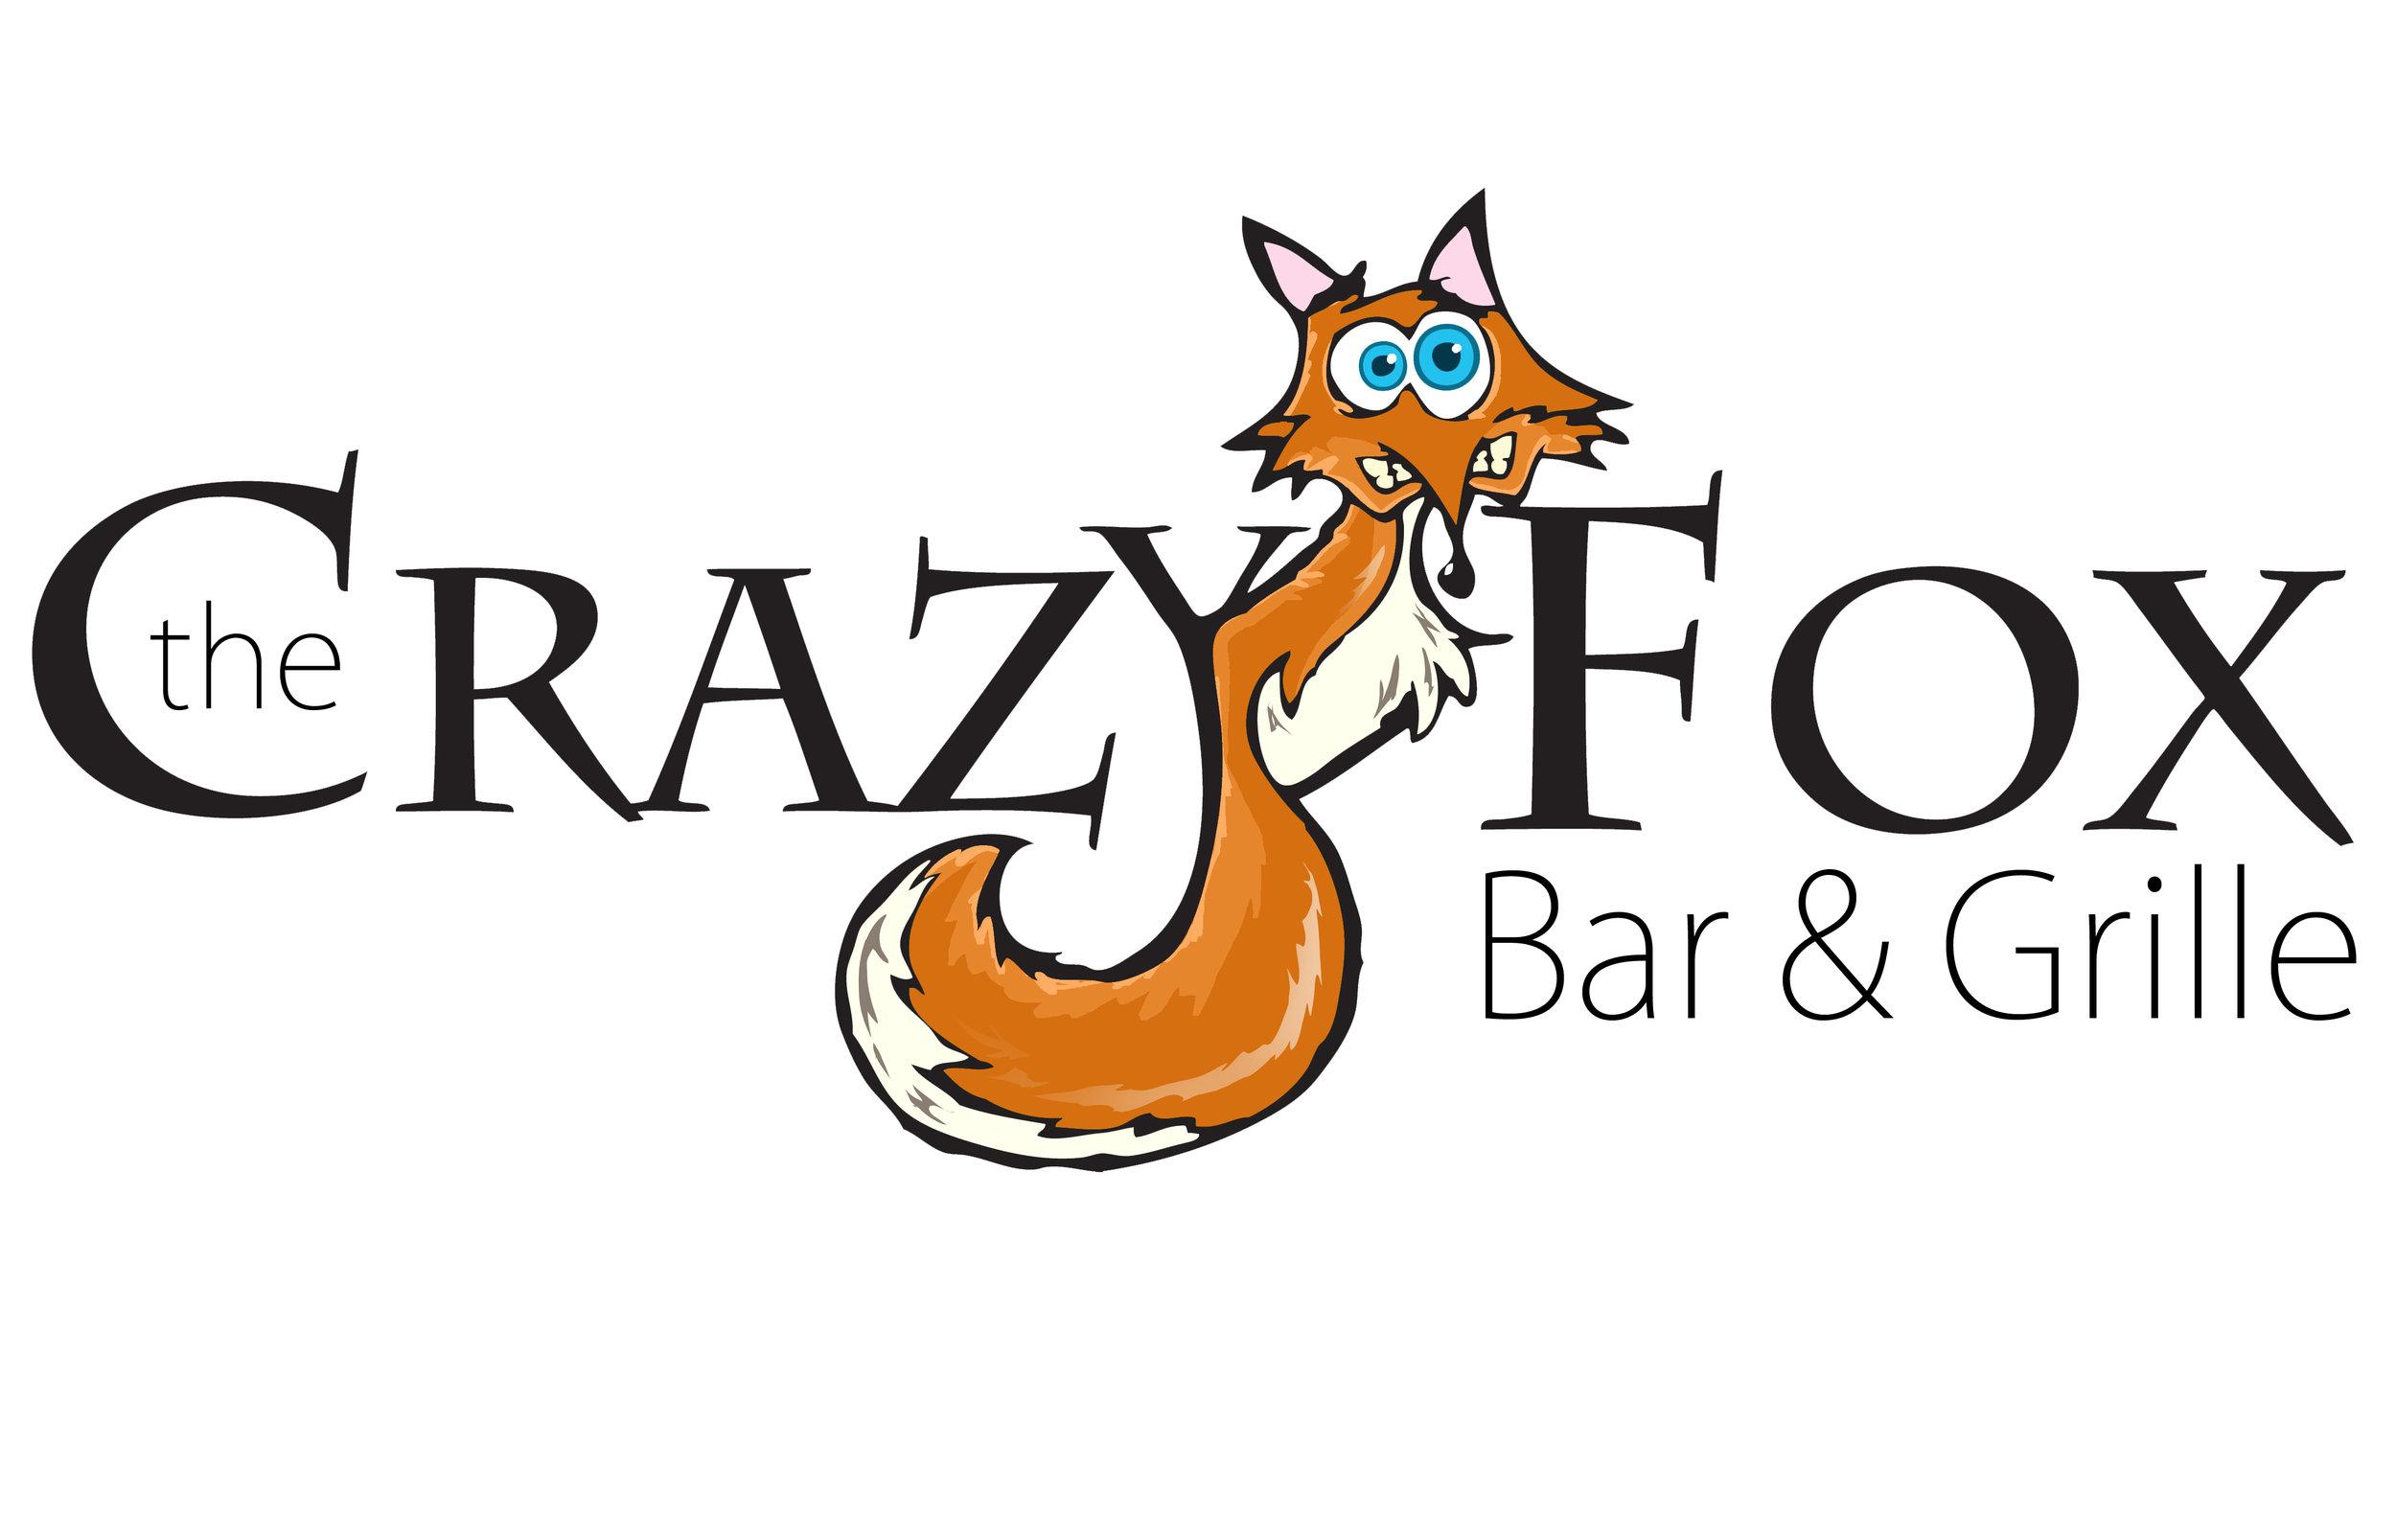 CRAZY FOX COLOR LARGE.jpg